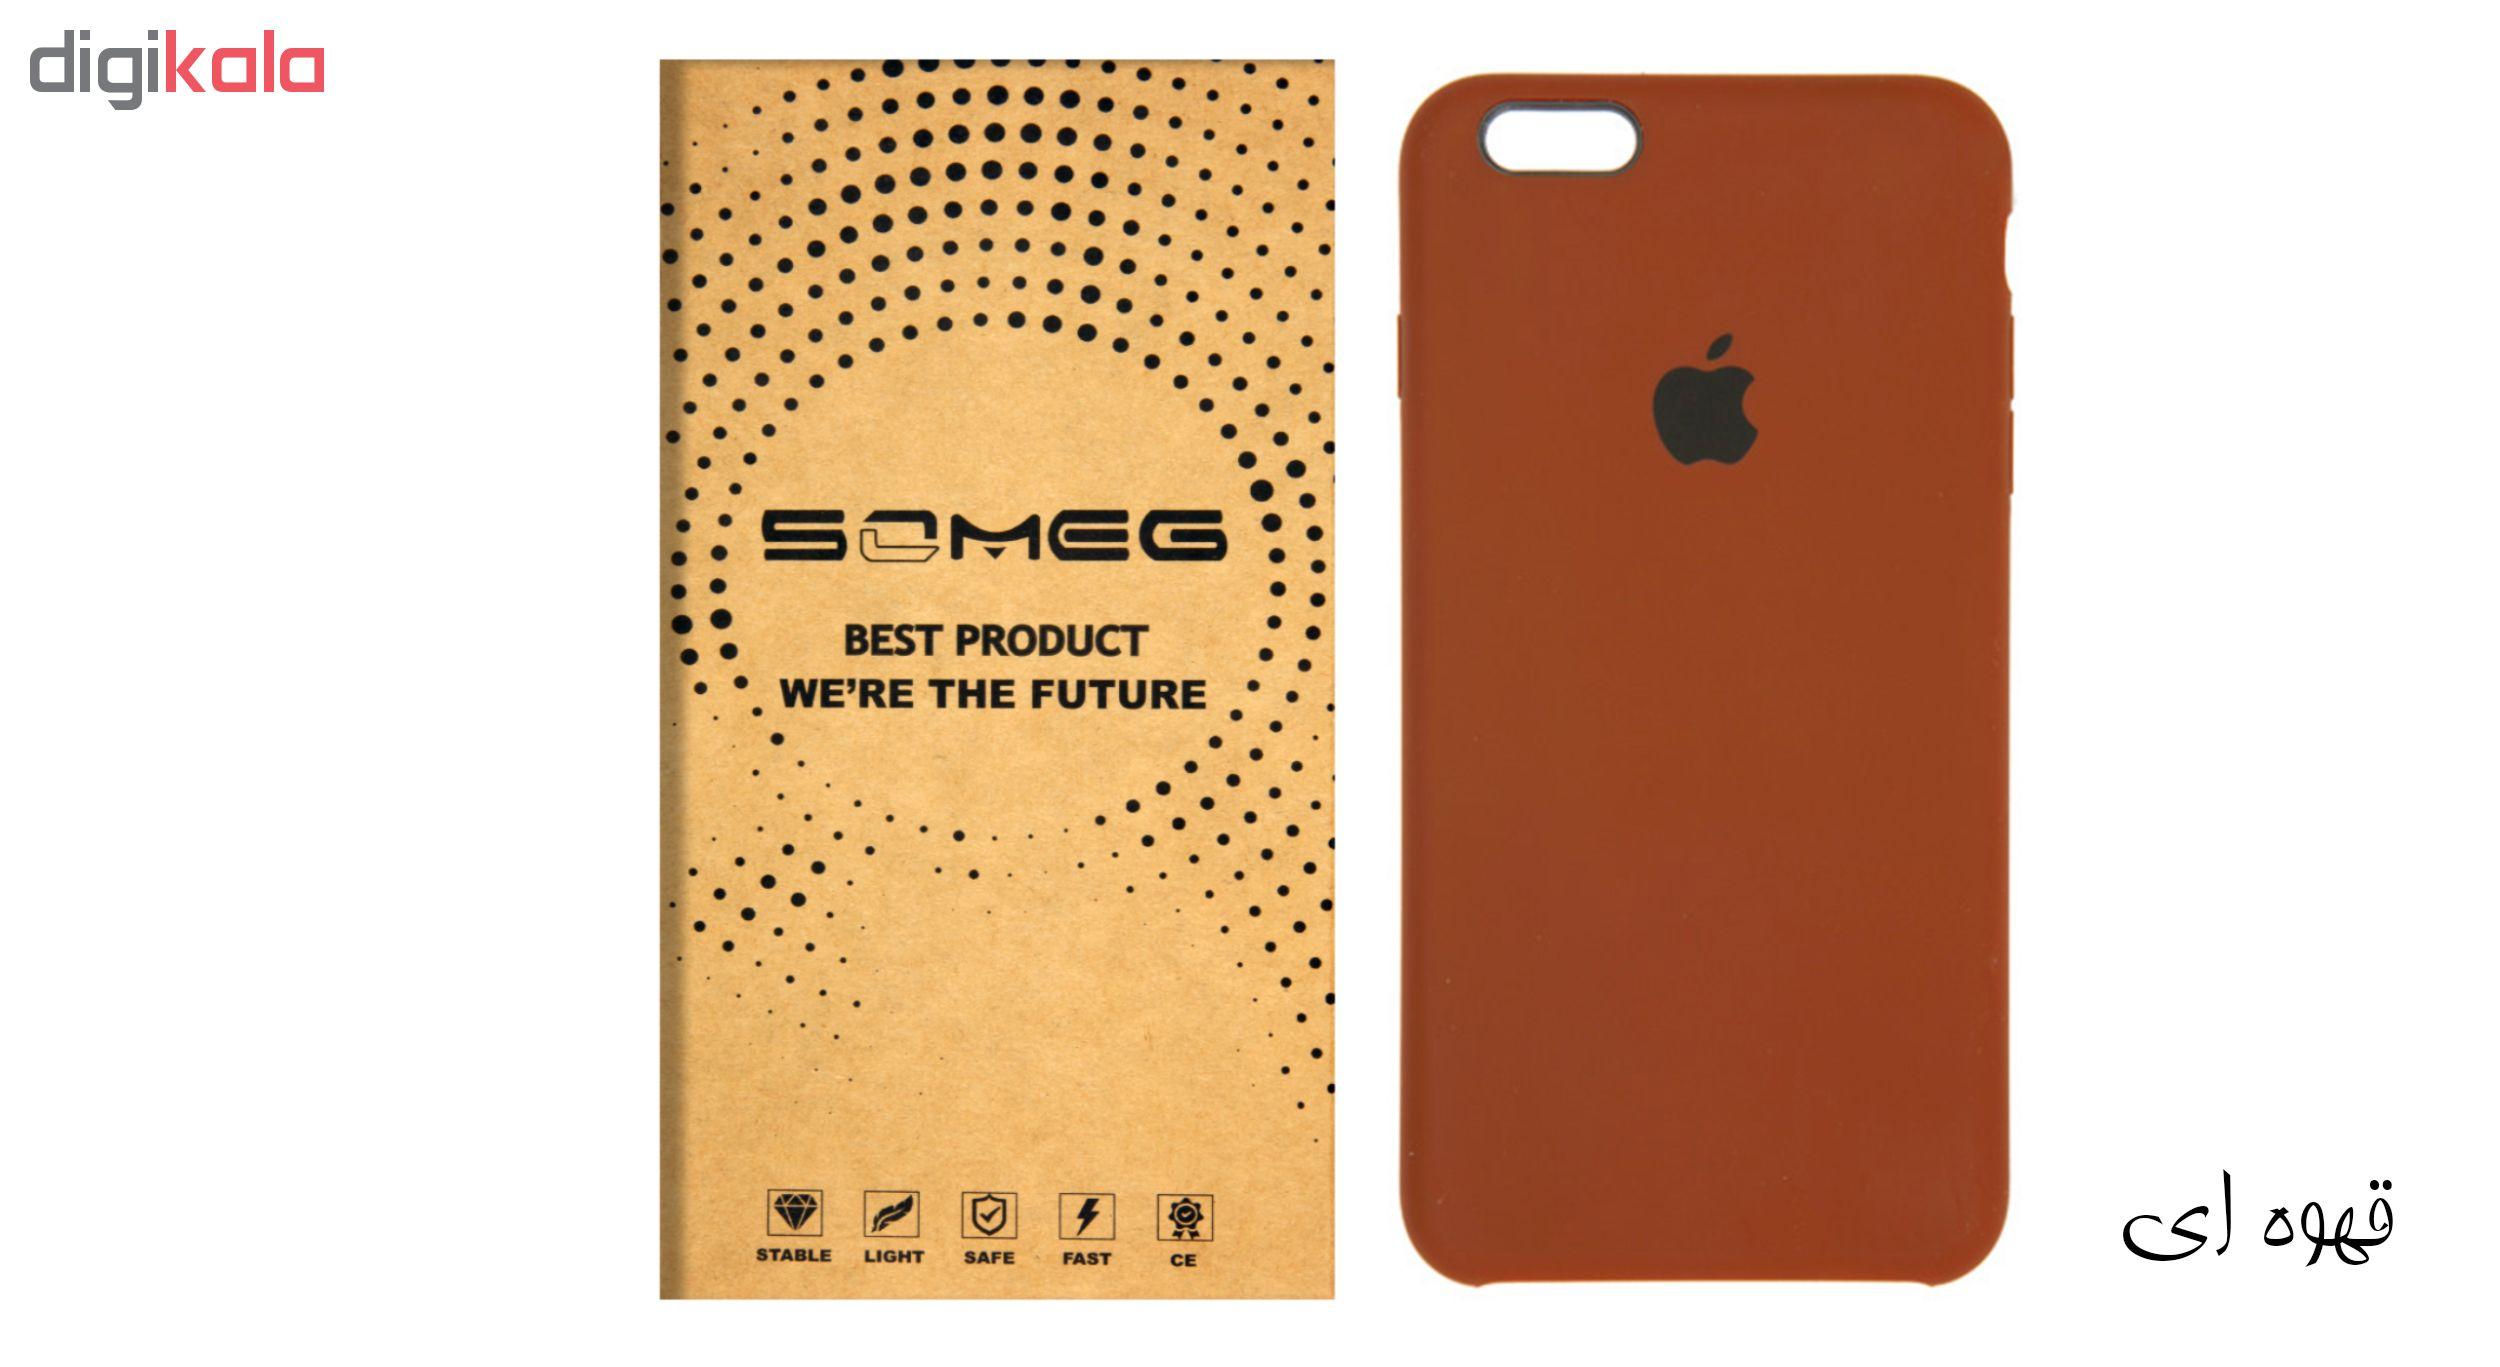 کاور سومگ مدل SIC مناسب برای گوشی موبایل اپل iPhone 6/6s main 1 27